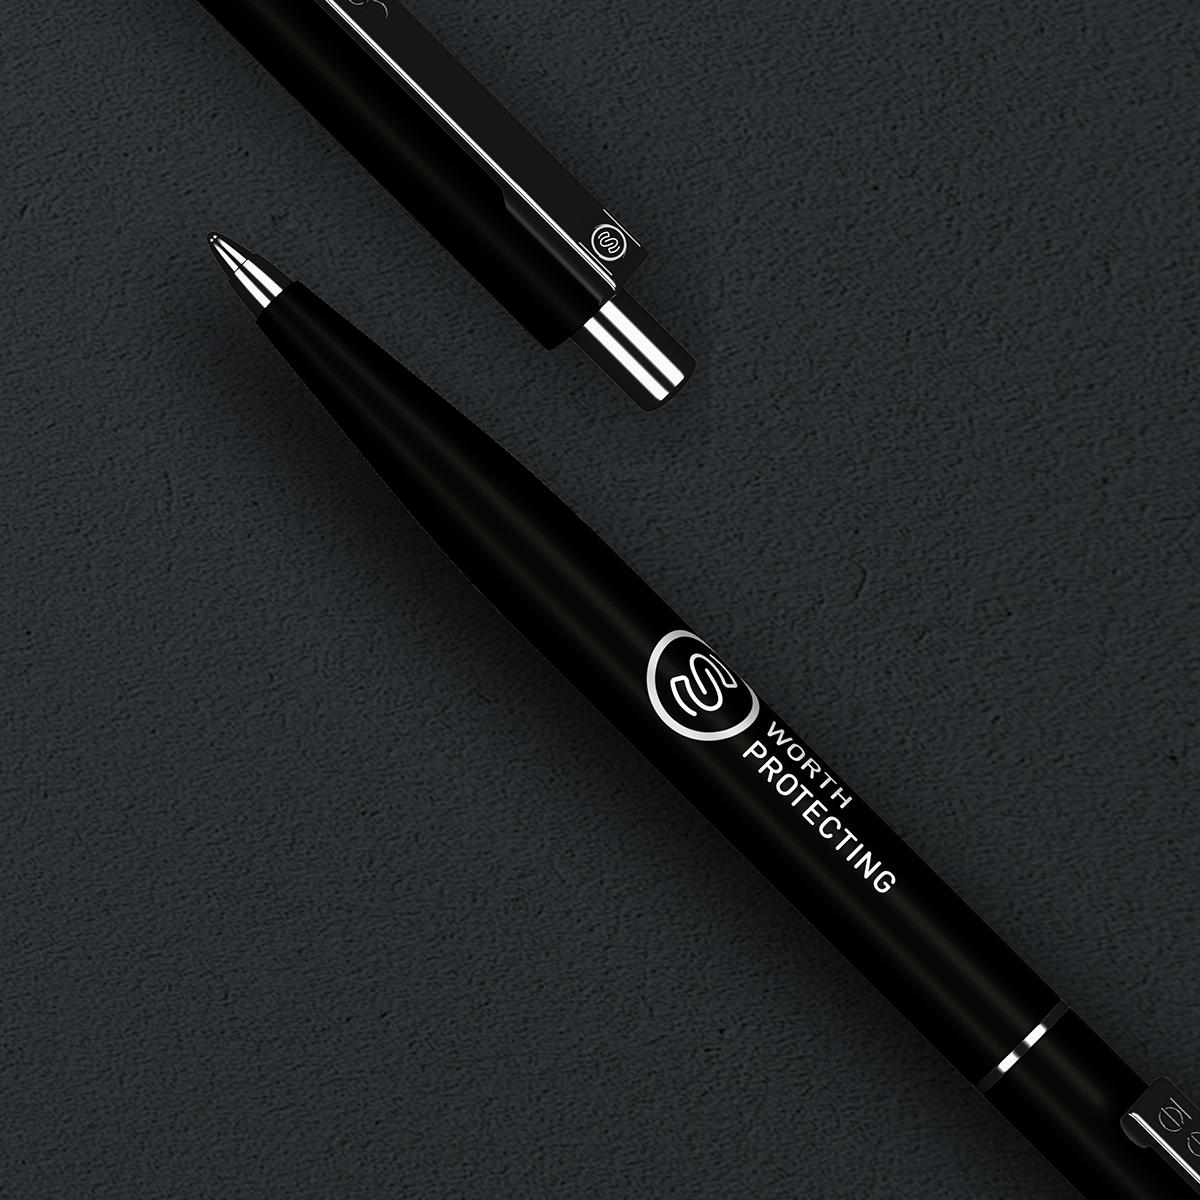 Seneworth - Branded pens